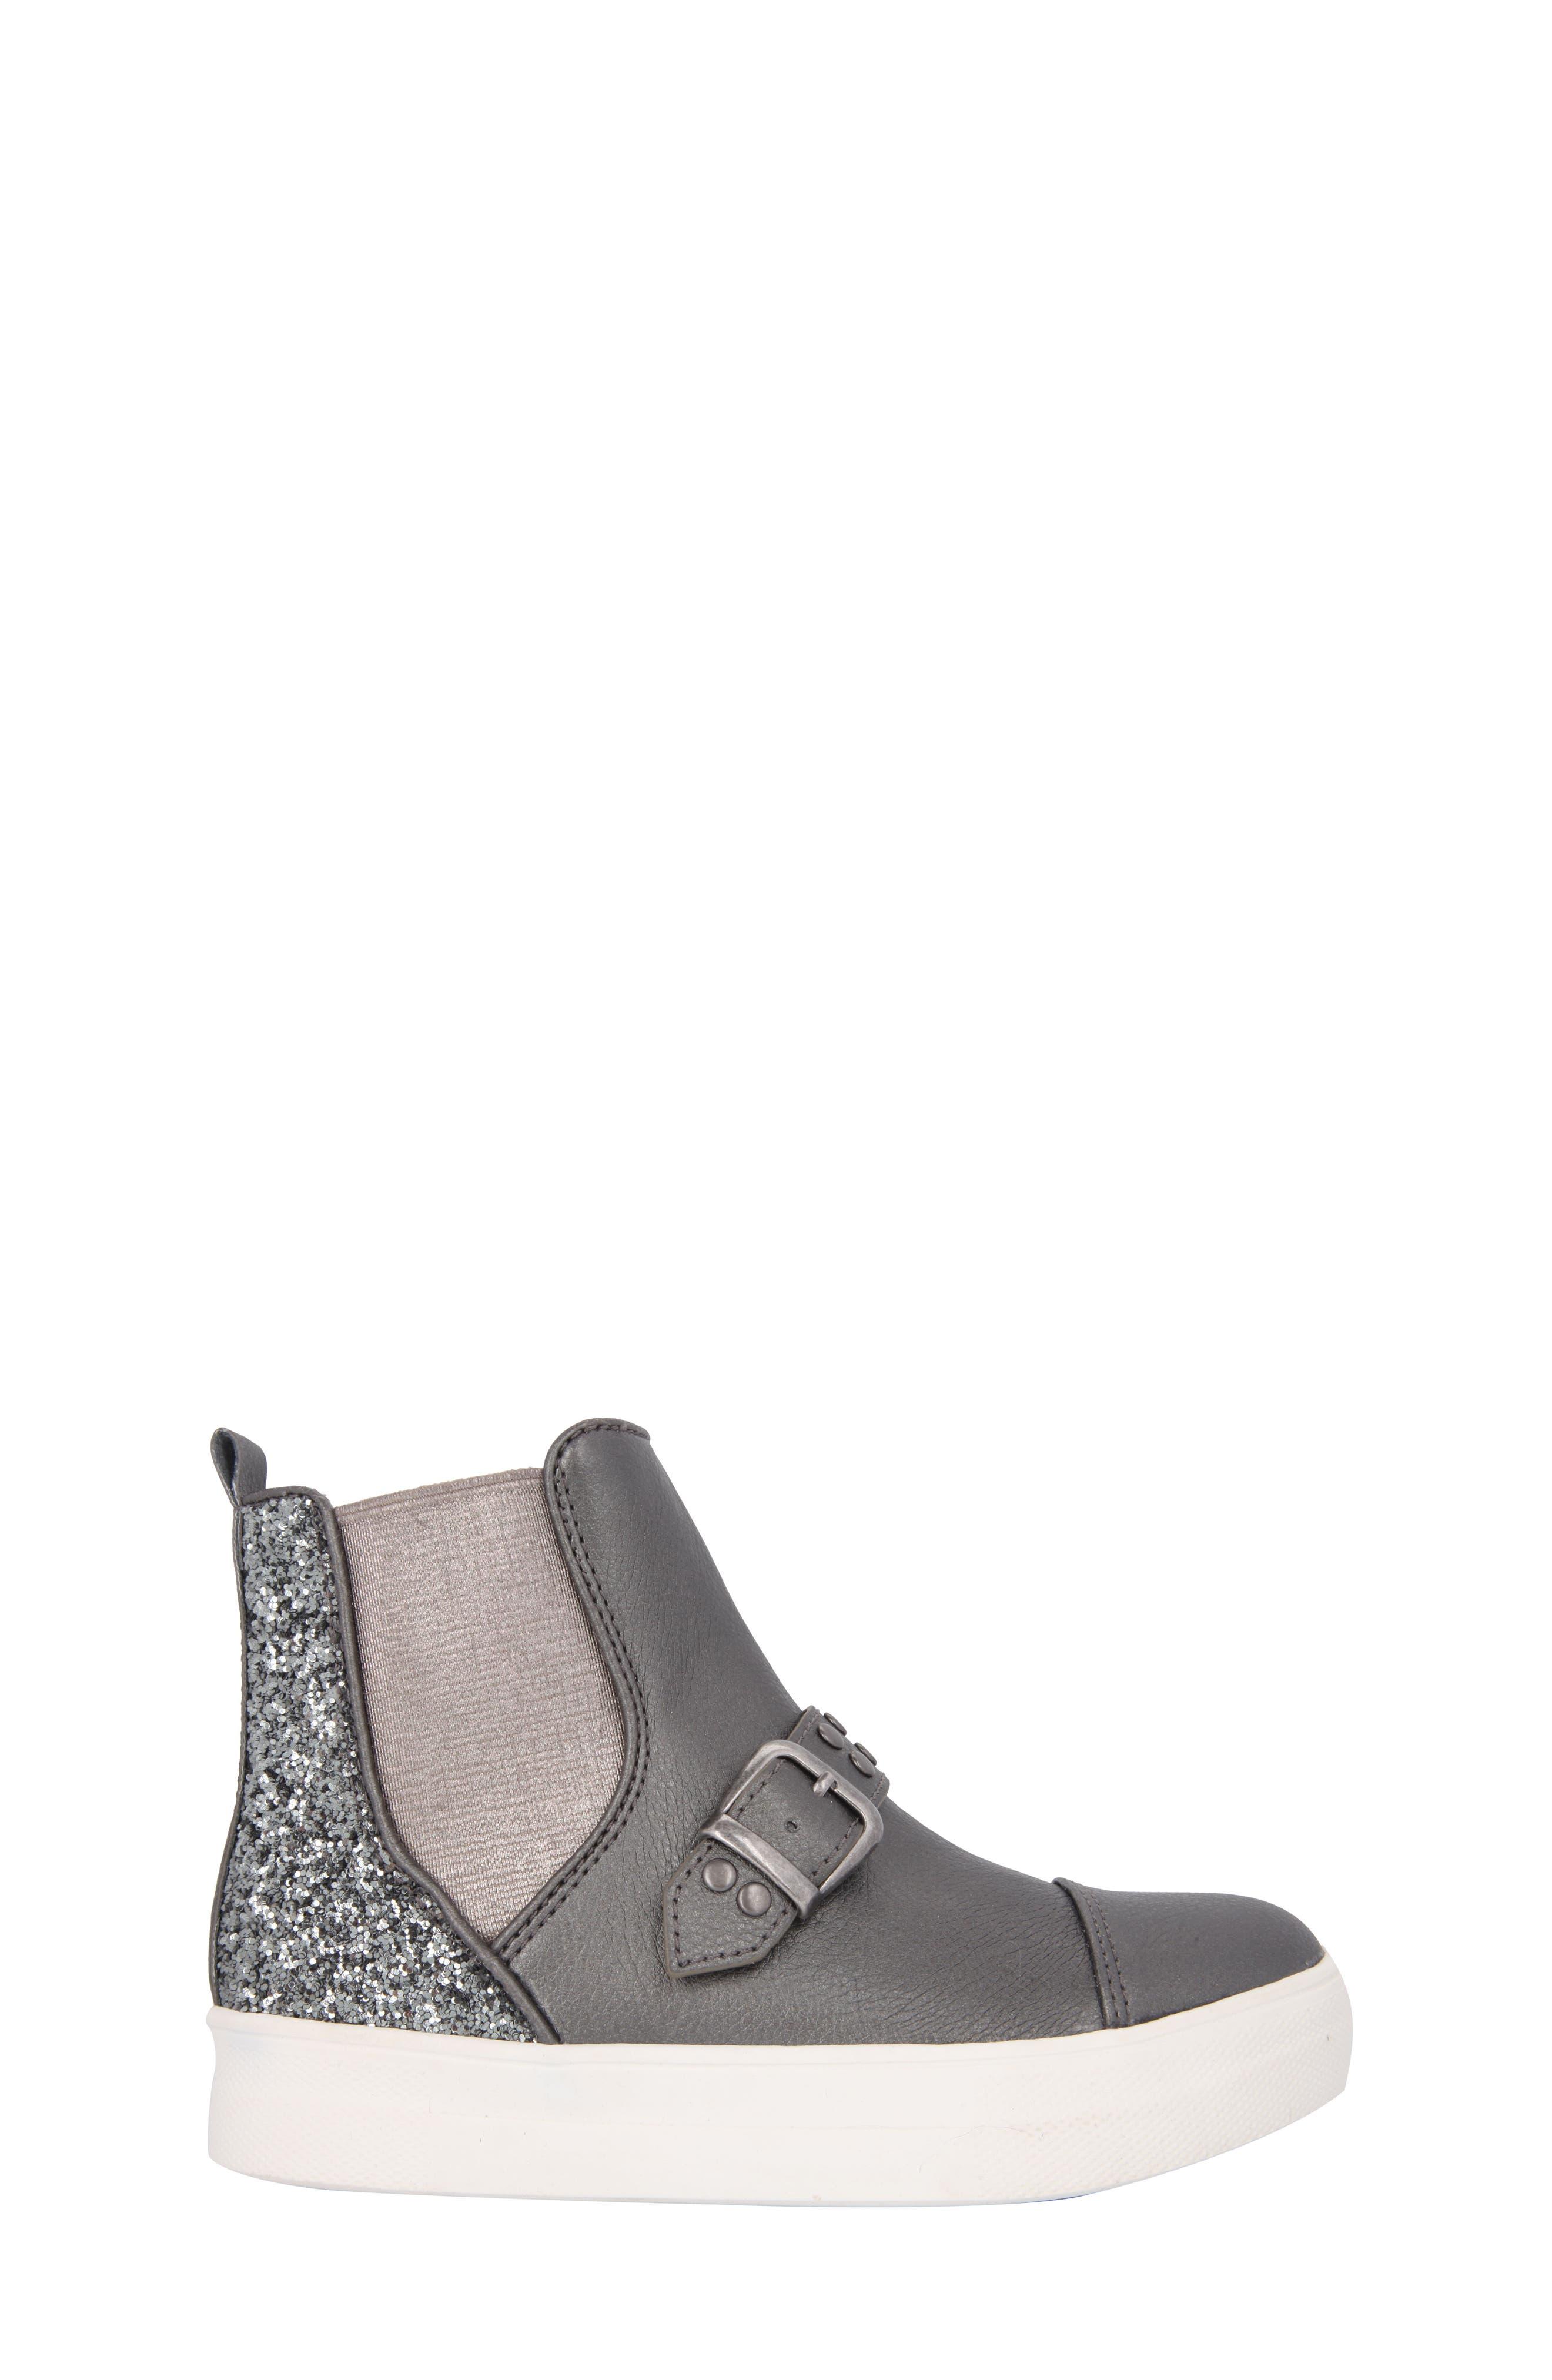 Pammela Glittery High Top Sneaker,                             Alternate thumbnail 3, color,                             Metallic Pewter